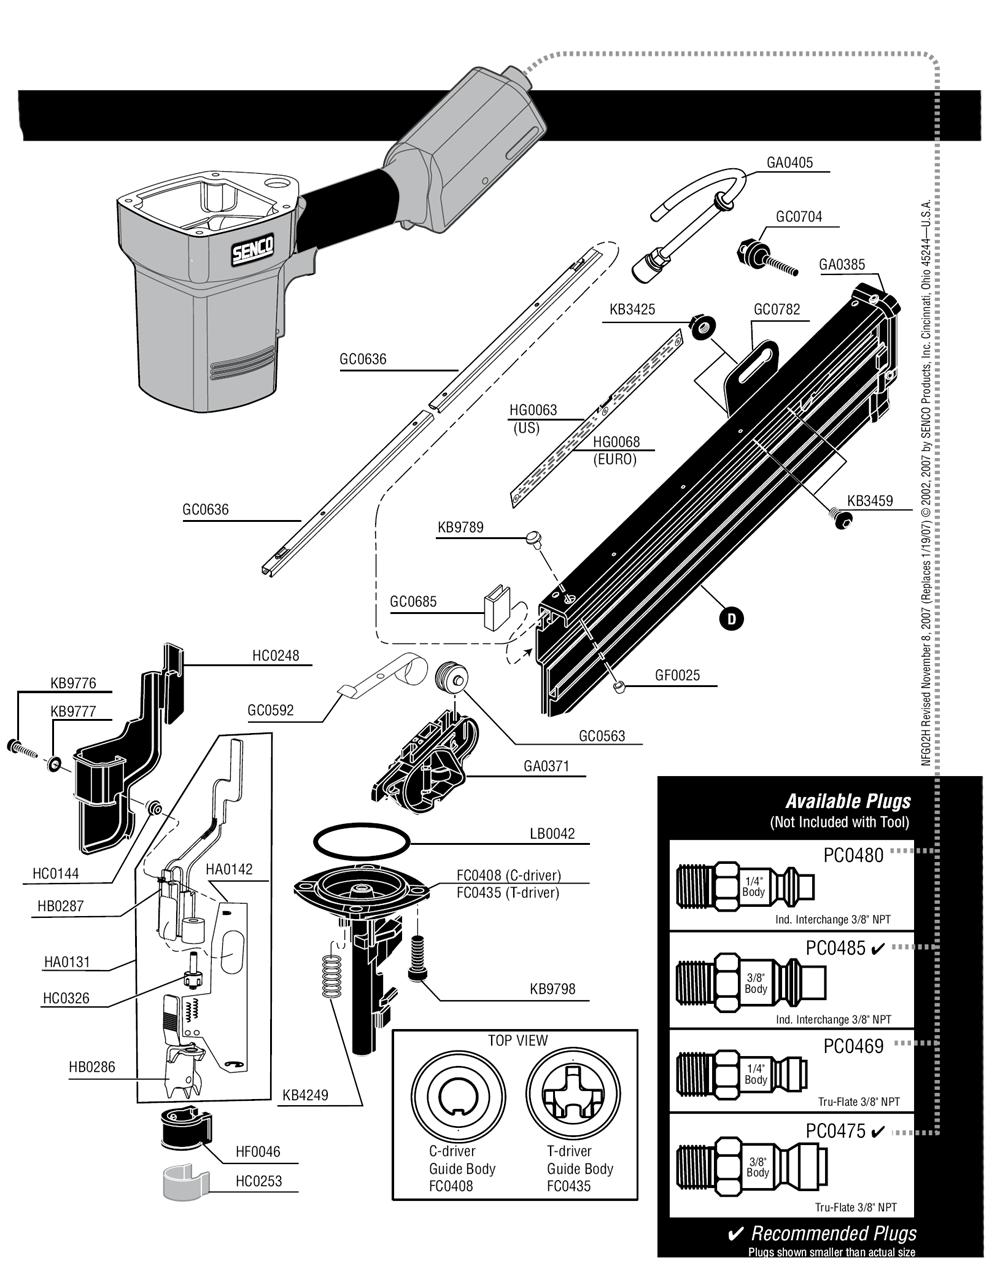 2H0133N-senco-PB-2Break Down